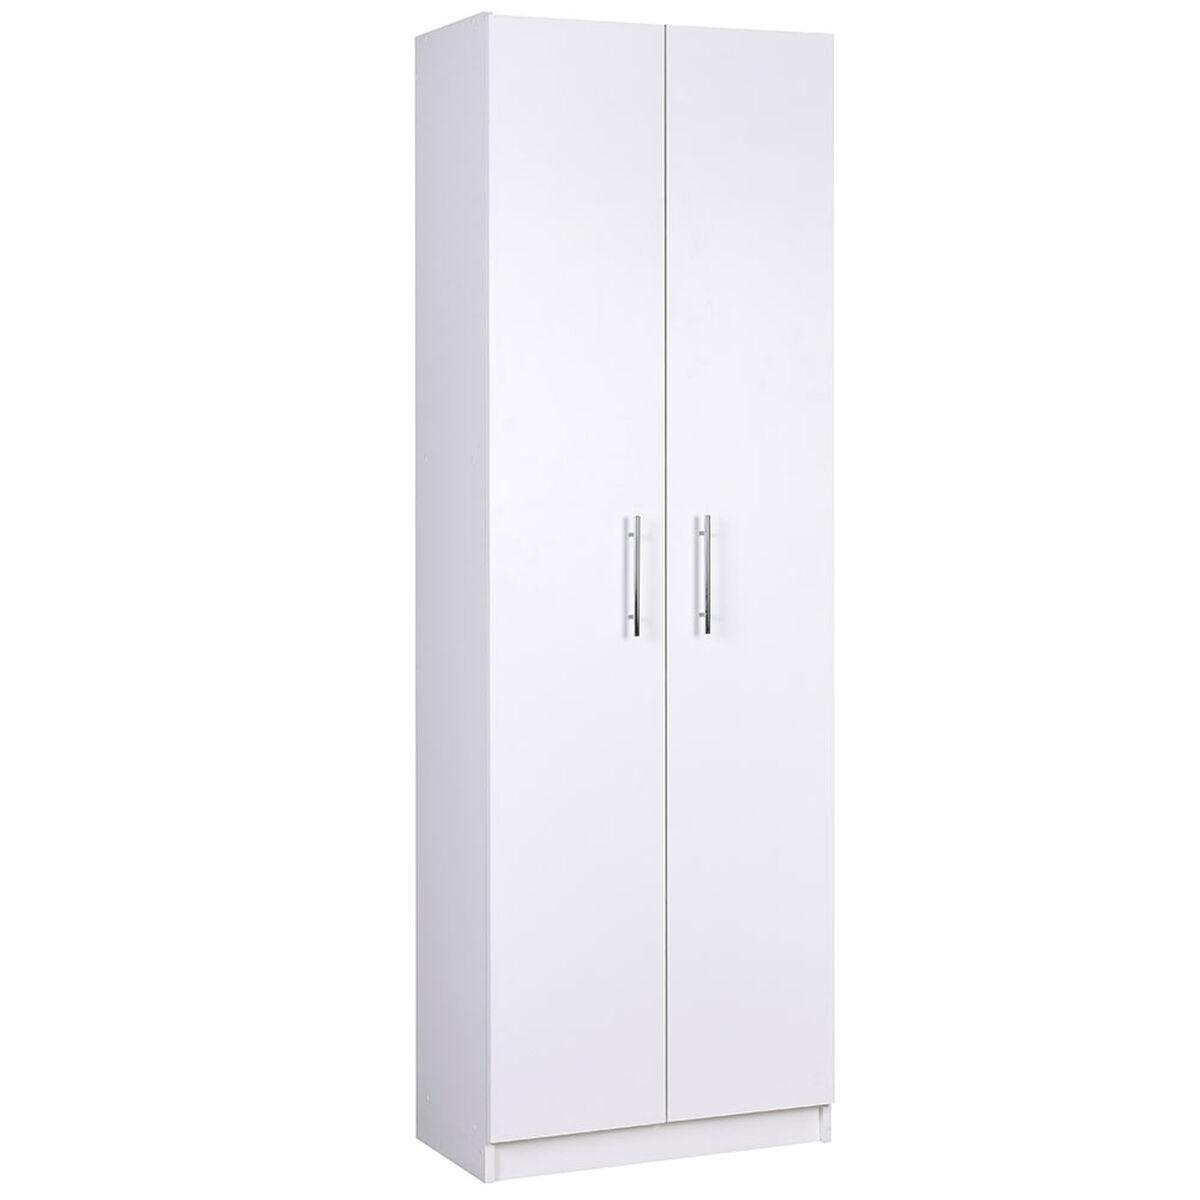 Mueble Despensero CIC 2 Puertas